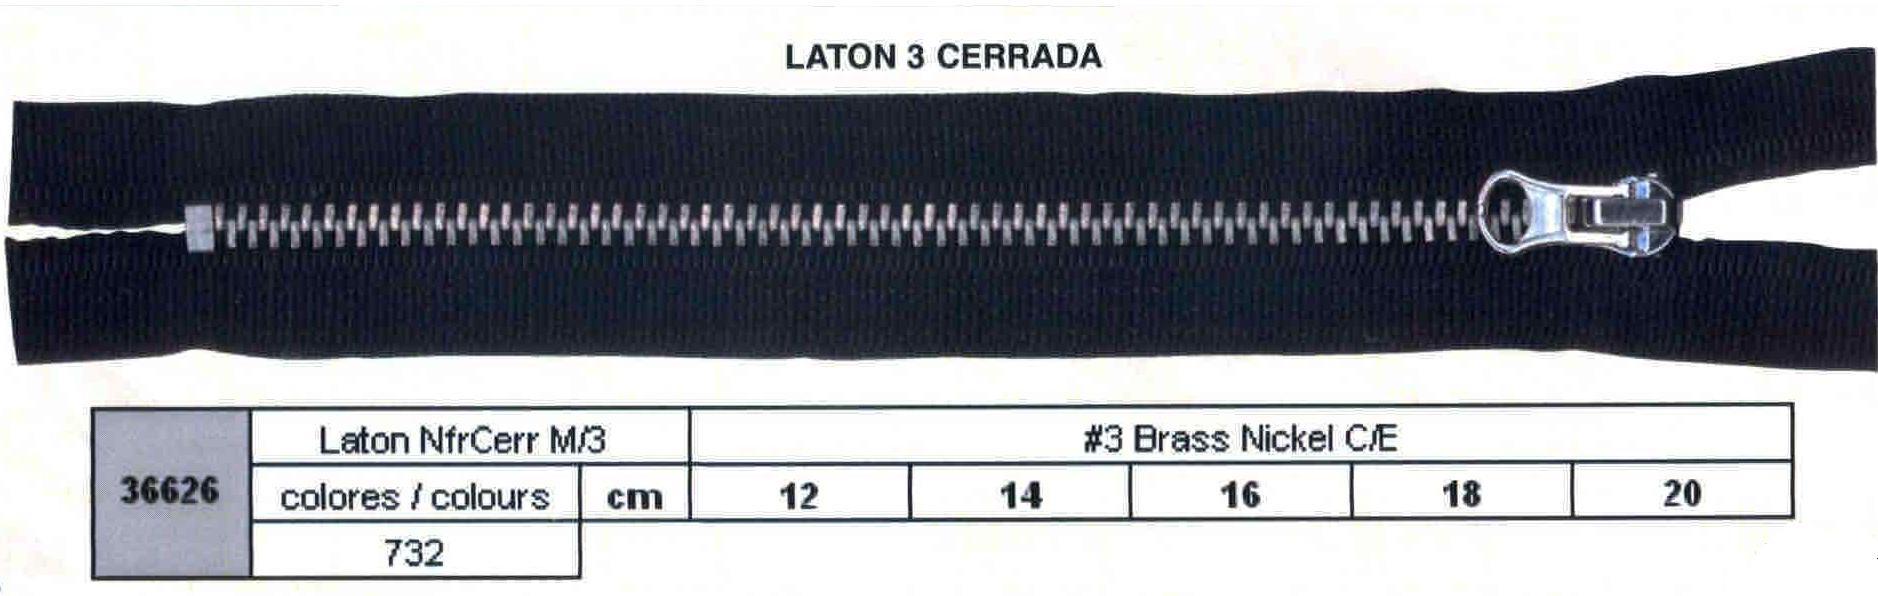 Cremallera SNS Latón NFR Cerrada num. 3